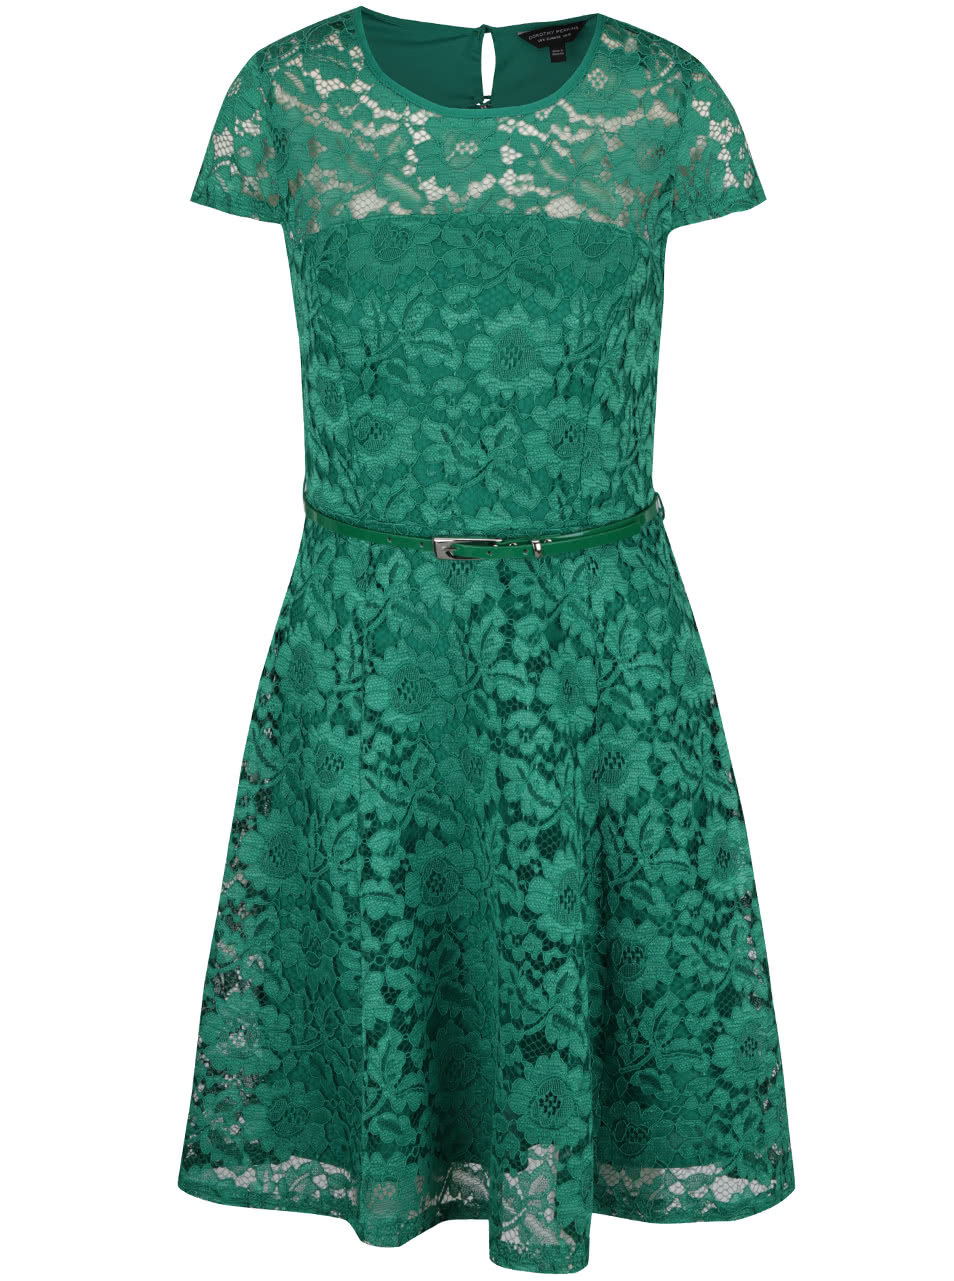 c409090afee1 Zelené krajkové šaty s páskem Dorothy Perkins ...